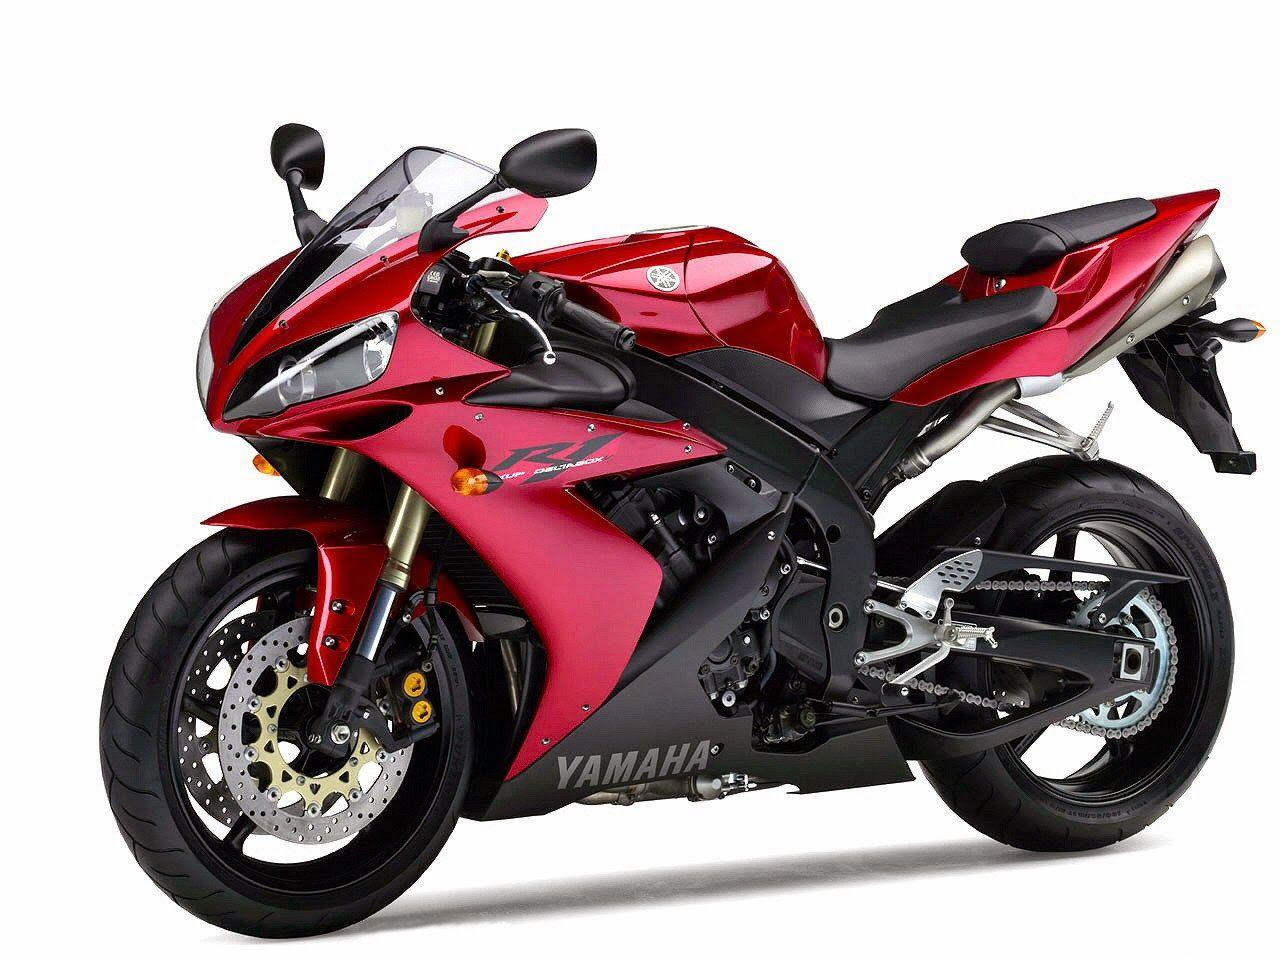 Picture Of Yamaha R1 Superbike Yamaha R1 Super Bikes Motorcycle